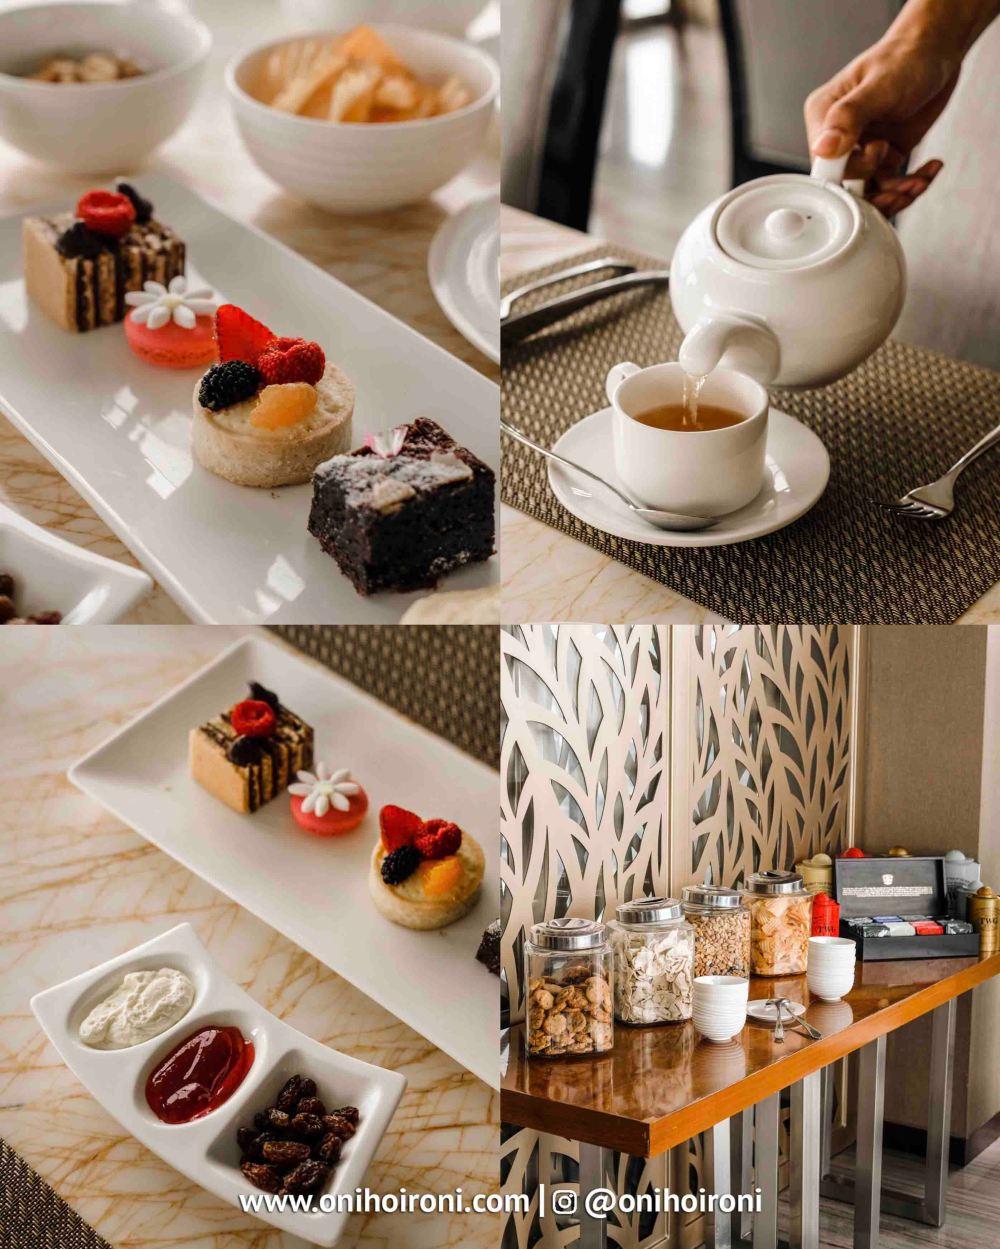 1 Afternoon tea Executive Lounge Intercontinental Bandung Oni Hoironi